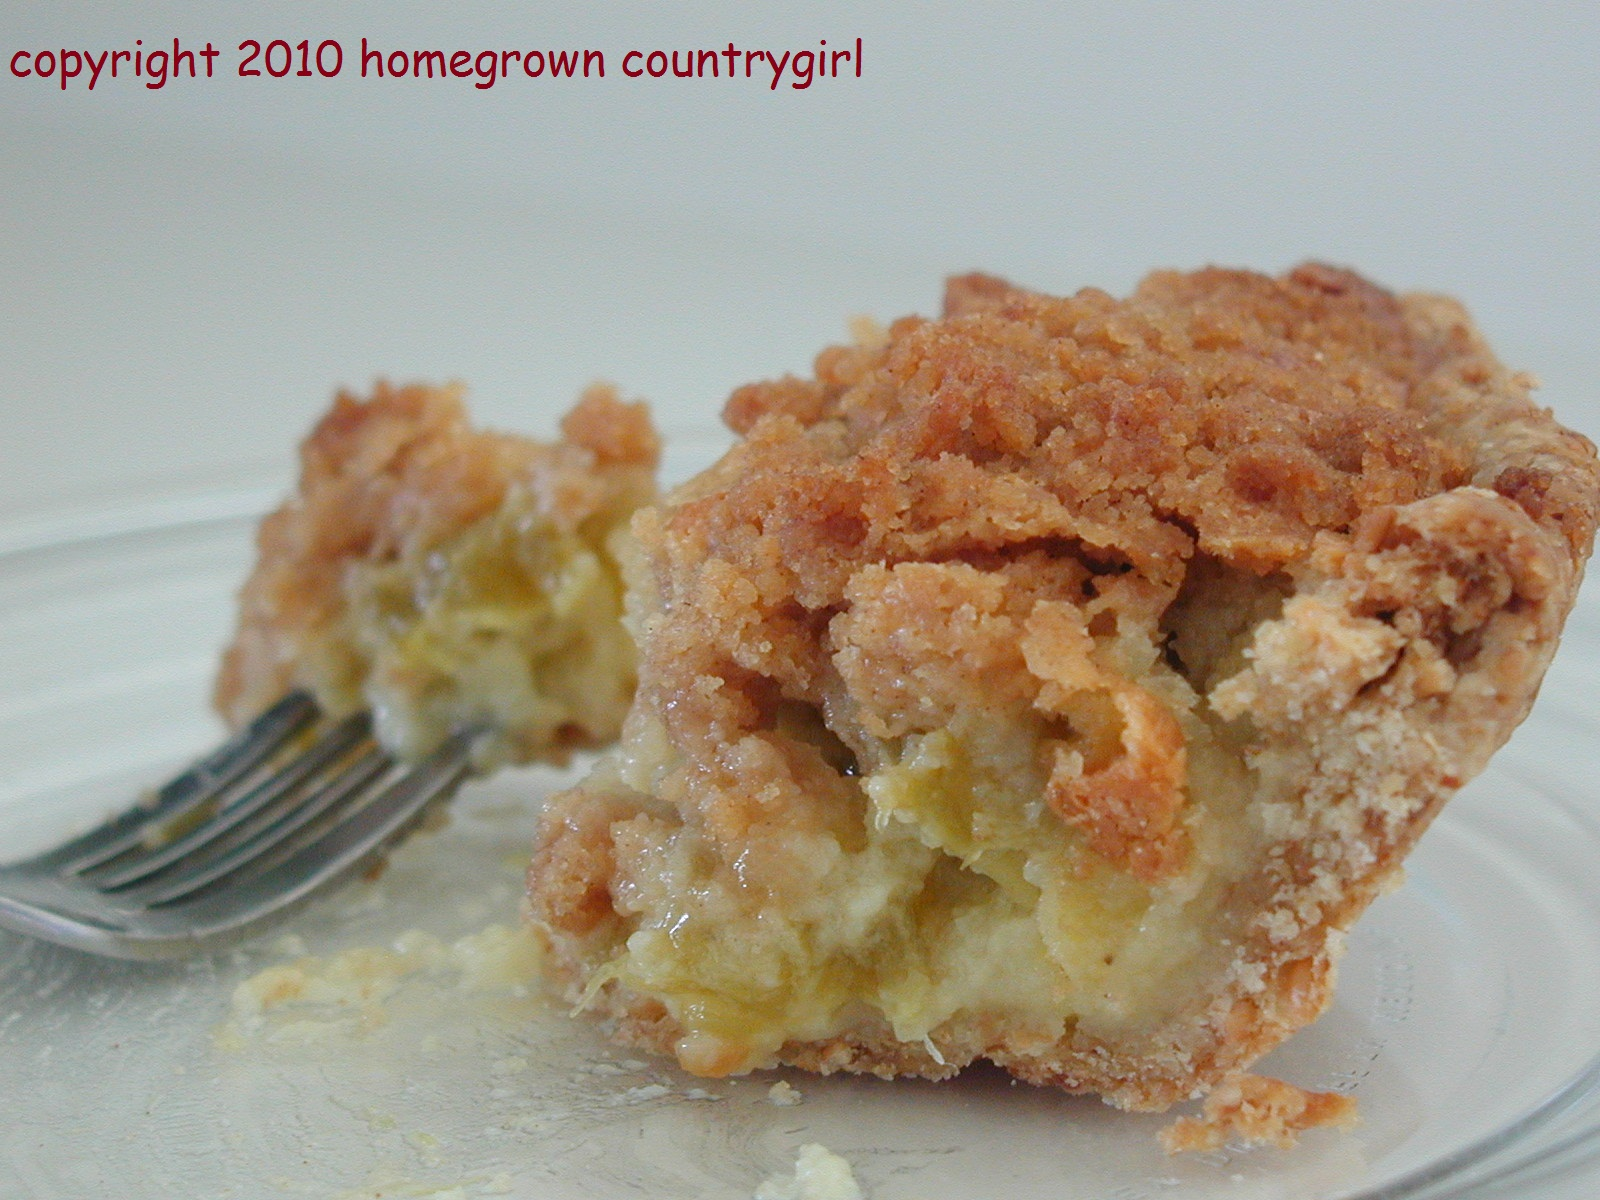 Sour Cream Rhubarb Pie | Tasty Kitchen: A Happy Recipe Community!